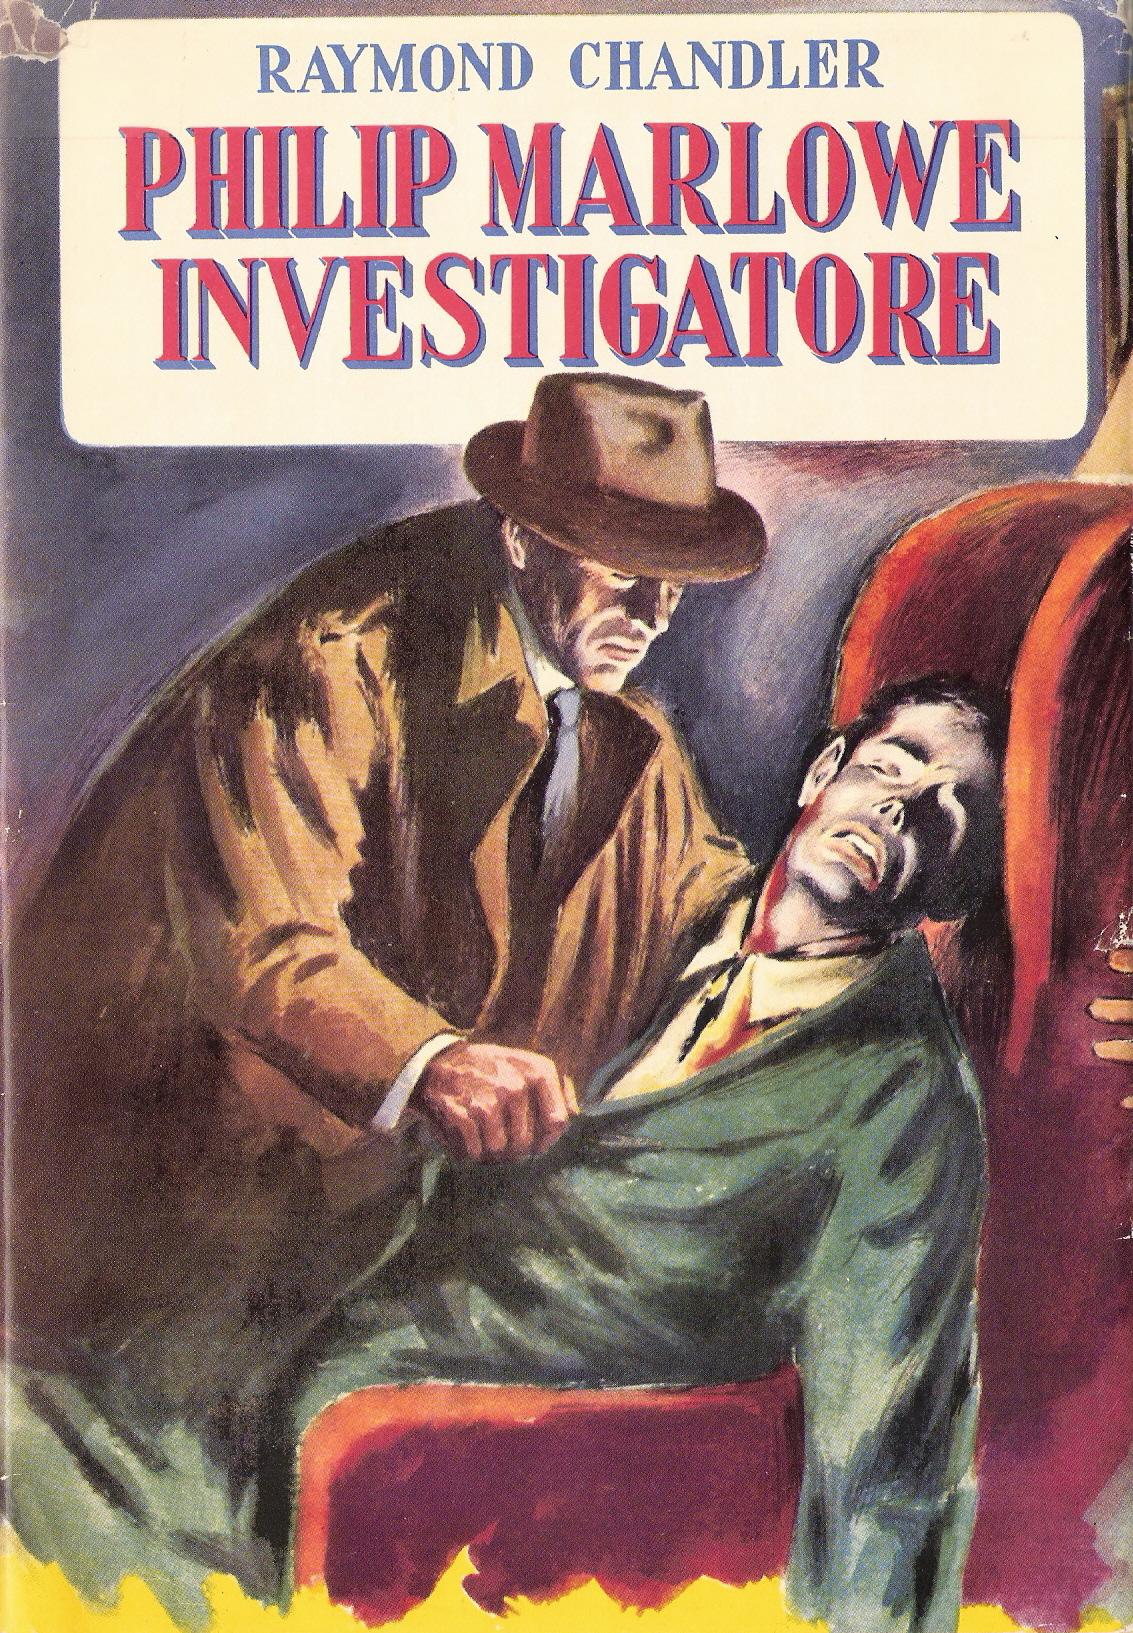 Philip Marlowe investigatore